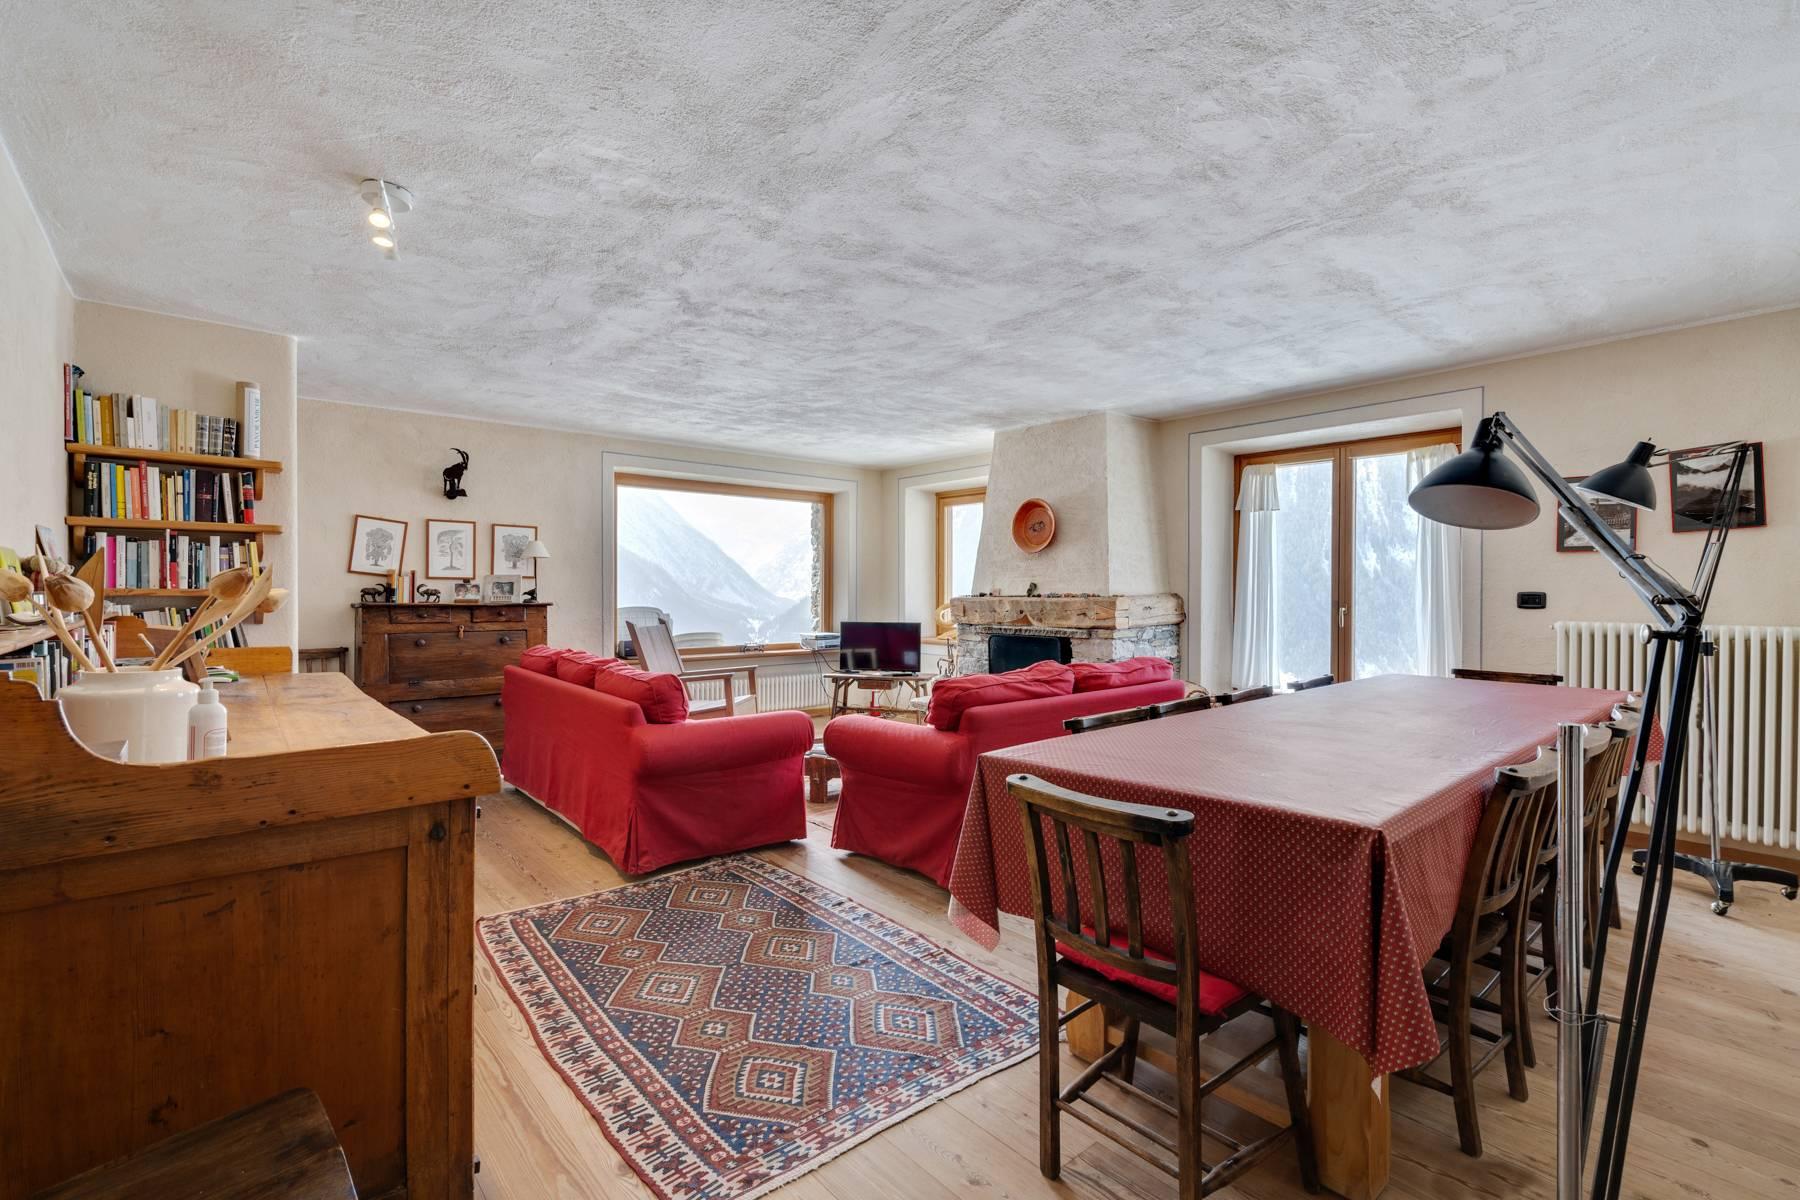 Villa in Vendita a Cogne: 5 locali, 384 mq - Foto 2